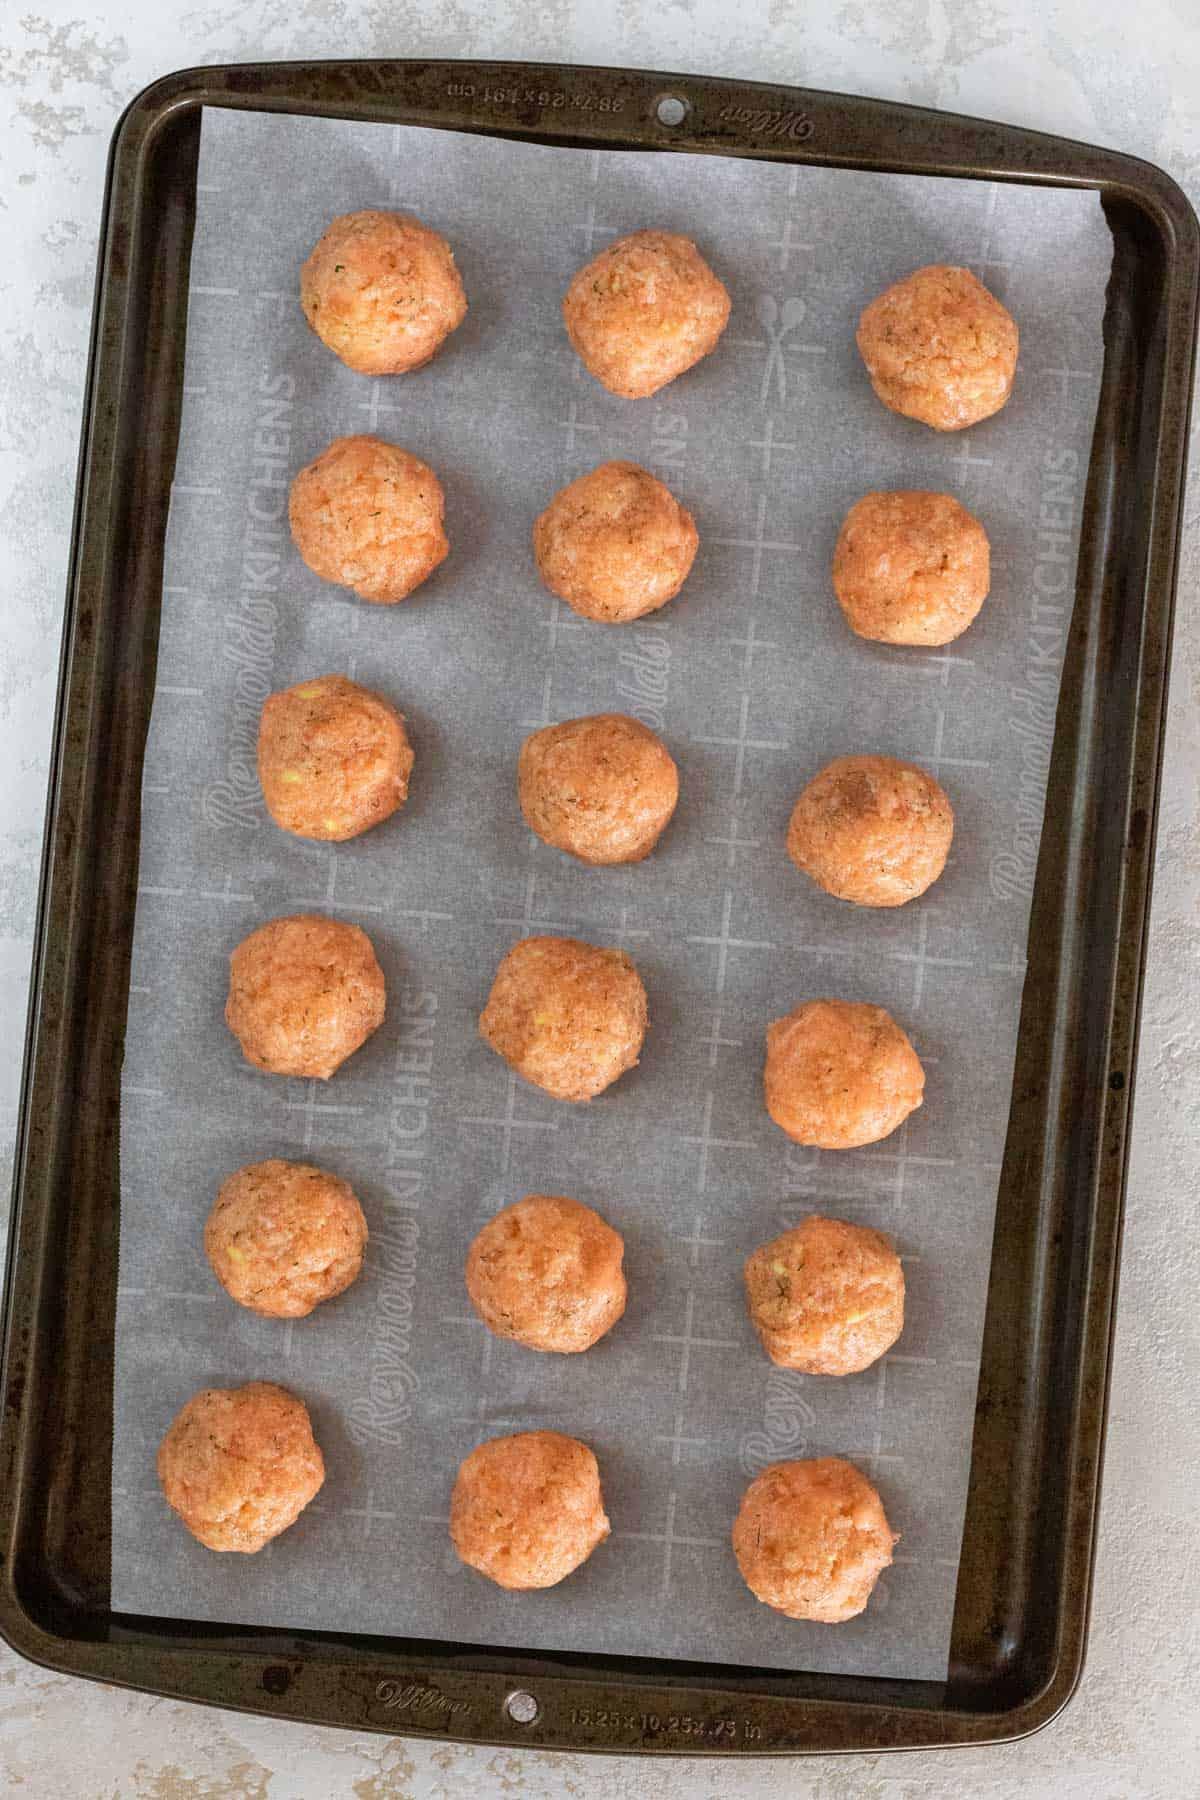 Raw salmon meatballs on a sheet pan.